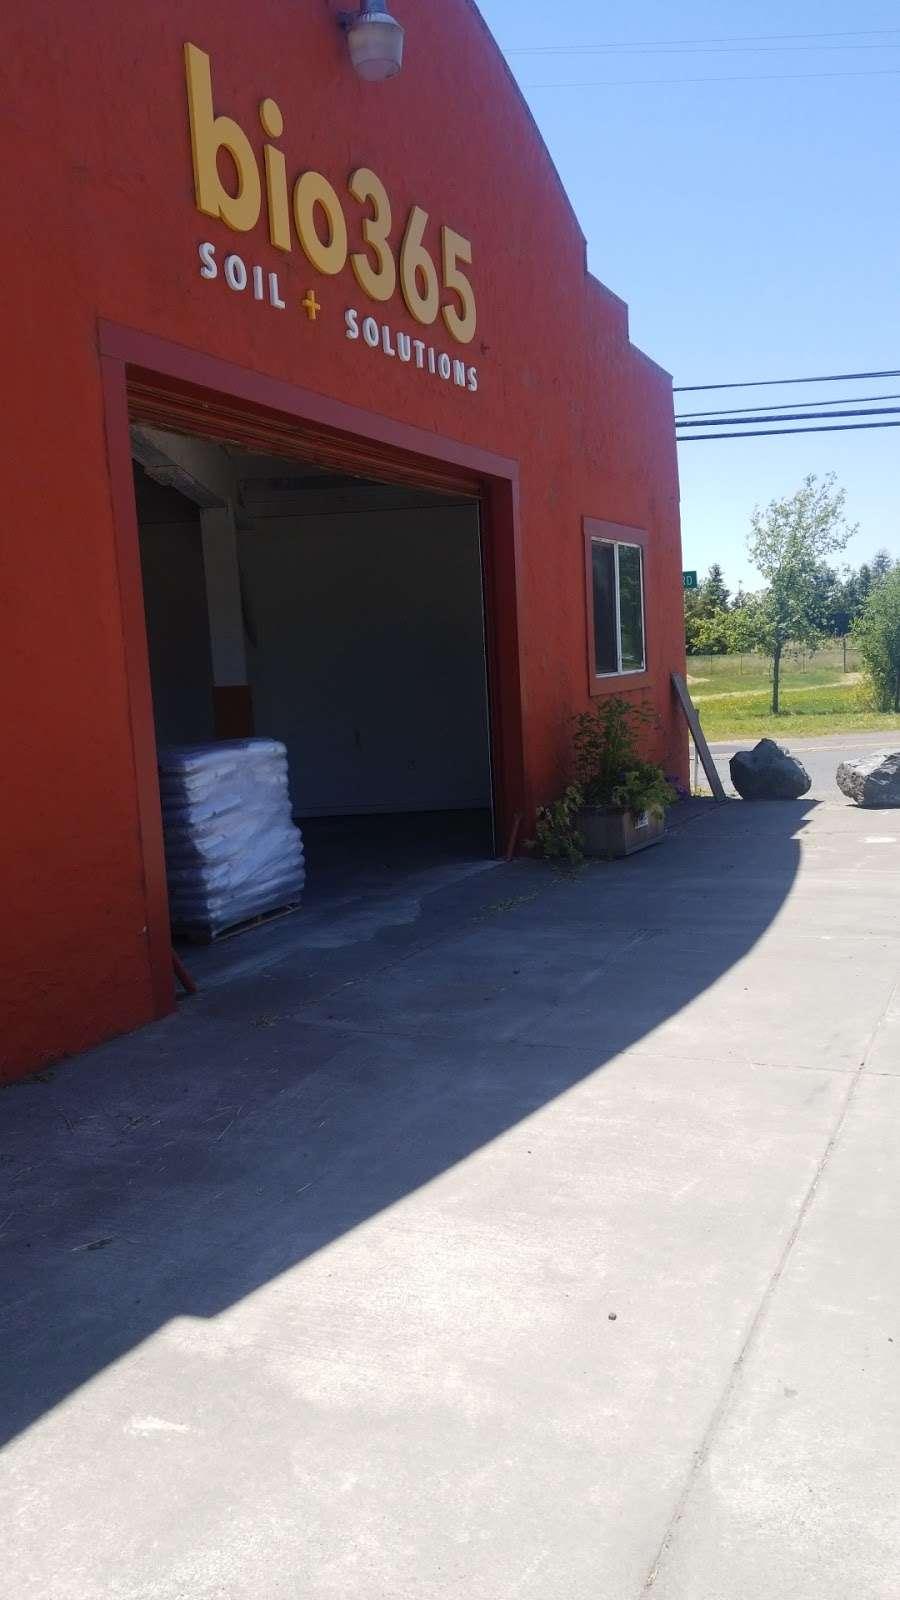 bio365 -Sebastopol Office and Warehouse - store    Photo 1 of 10   Address: 3880 Gravenstein Hwy S, Sebastopol, CA 95472, USA   Phone: (844) 707-3651